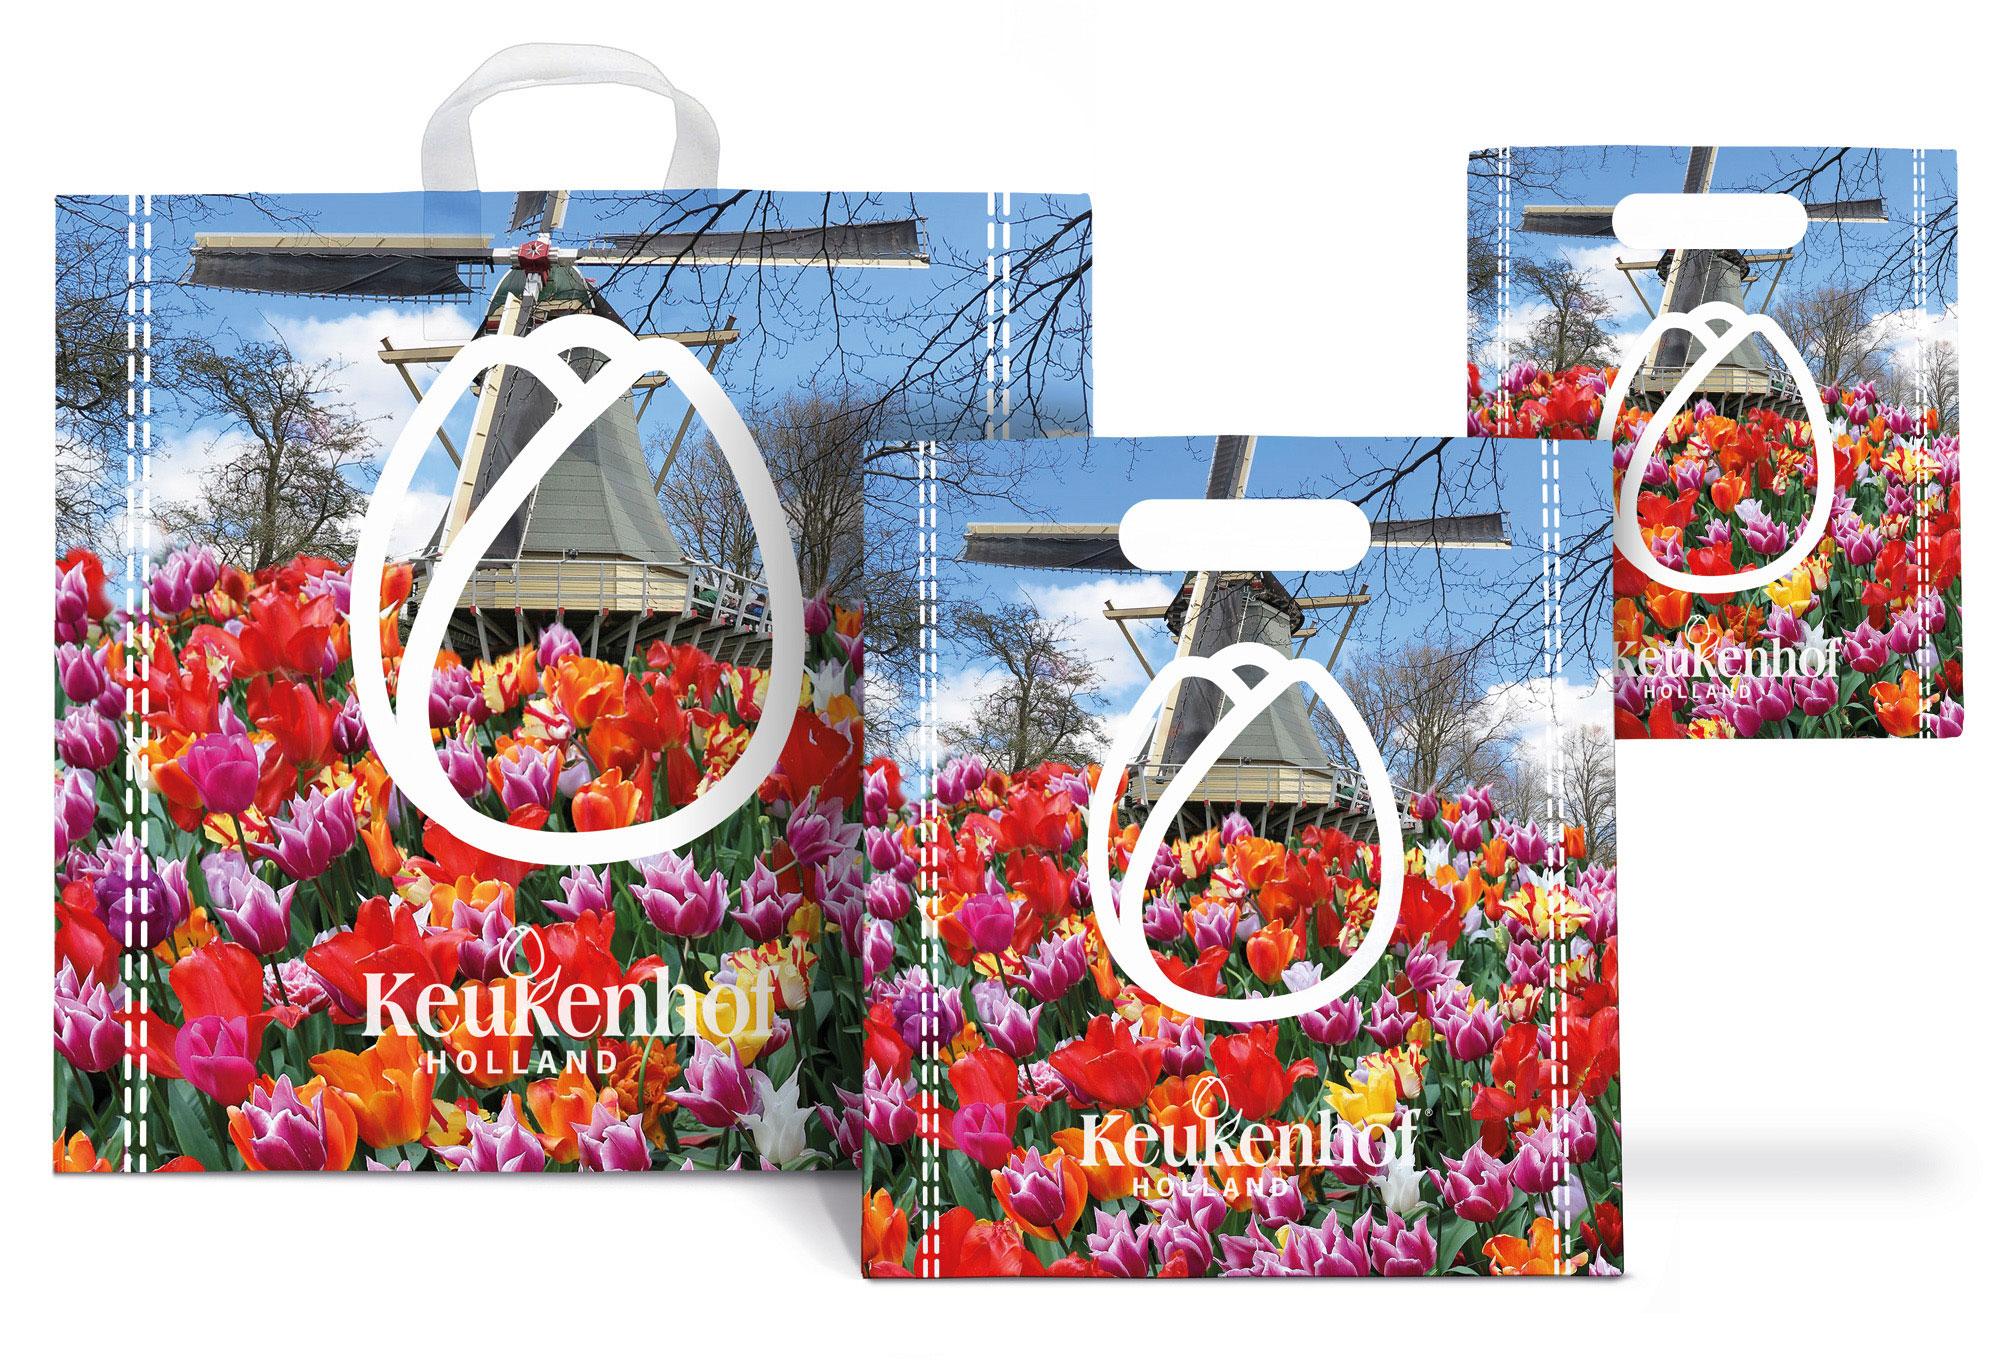 Keukenhof - plastic bags